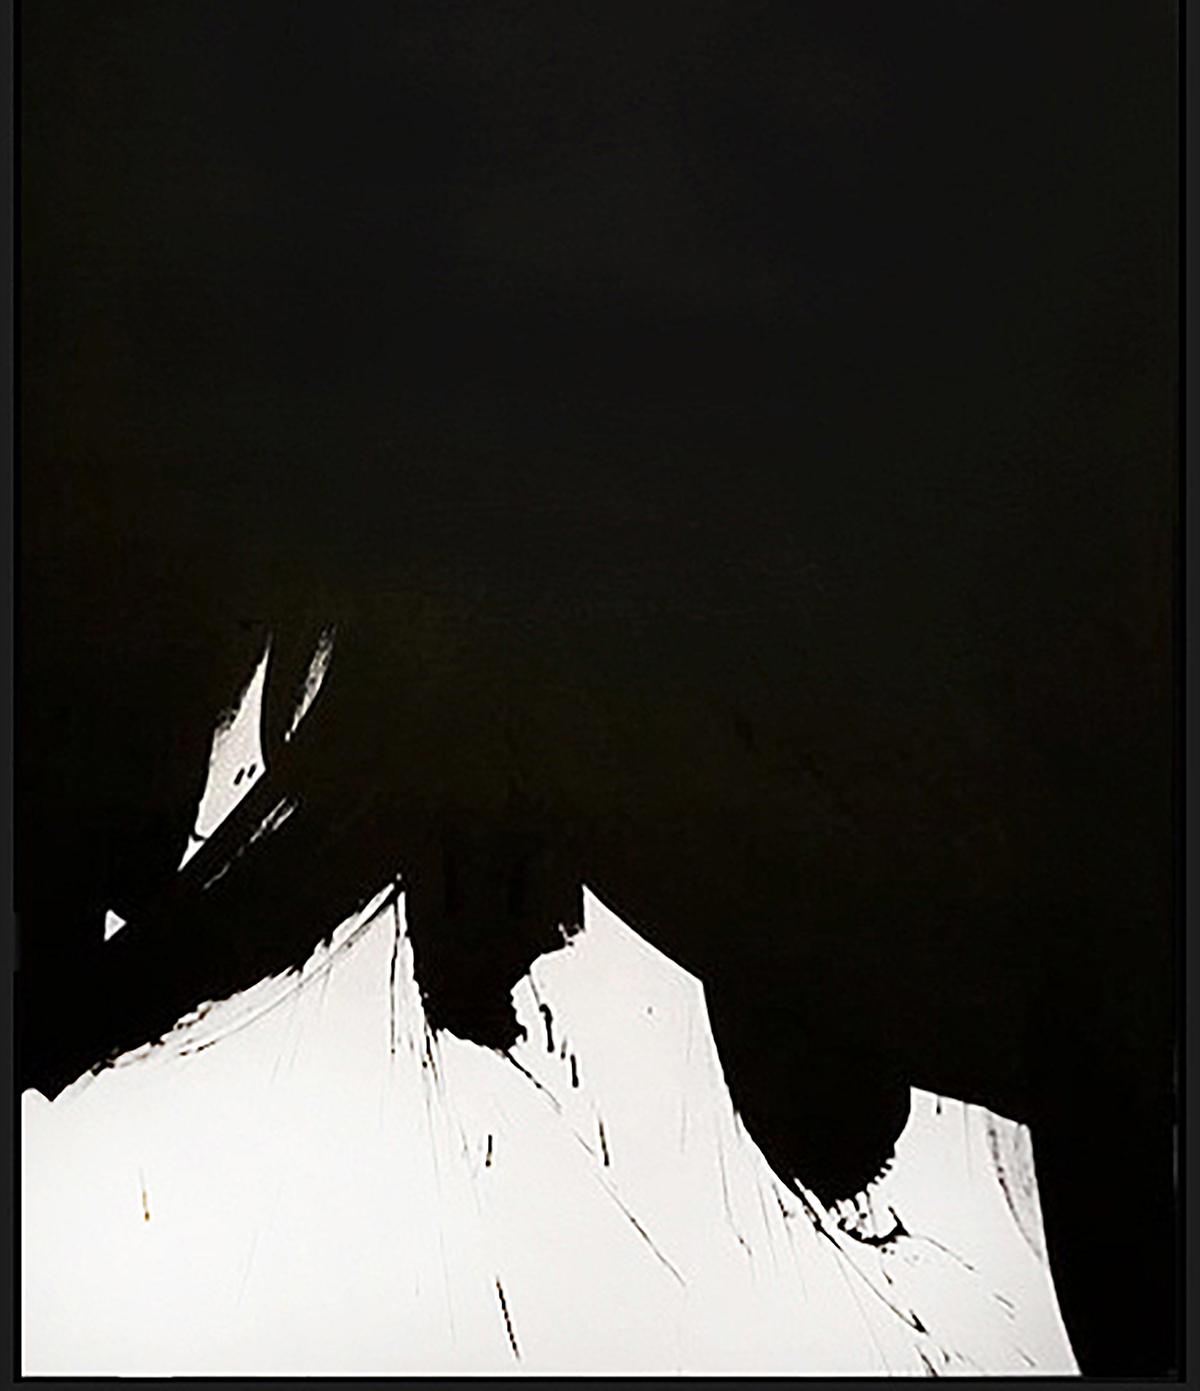 "Black & White #5, 2018, acrylic on canvas, 48"" x 36"" (122 x 91.4 cm)"